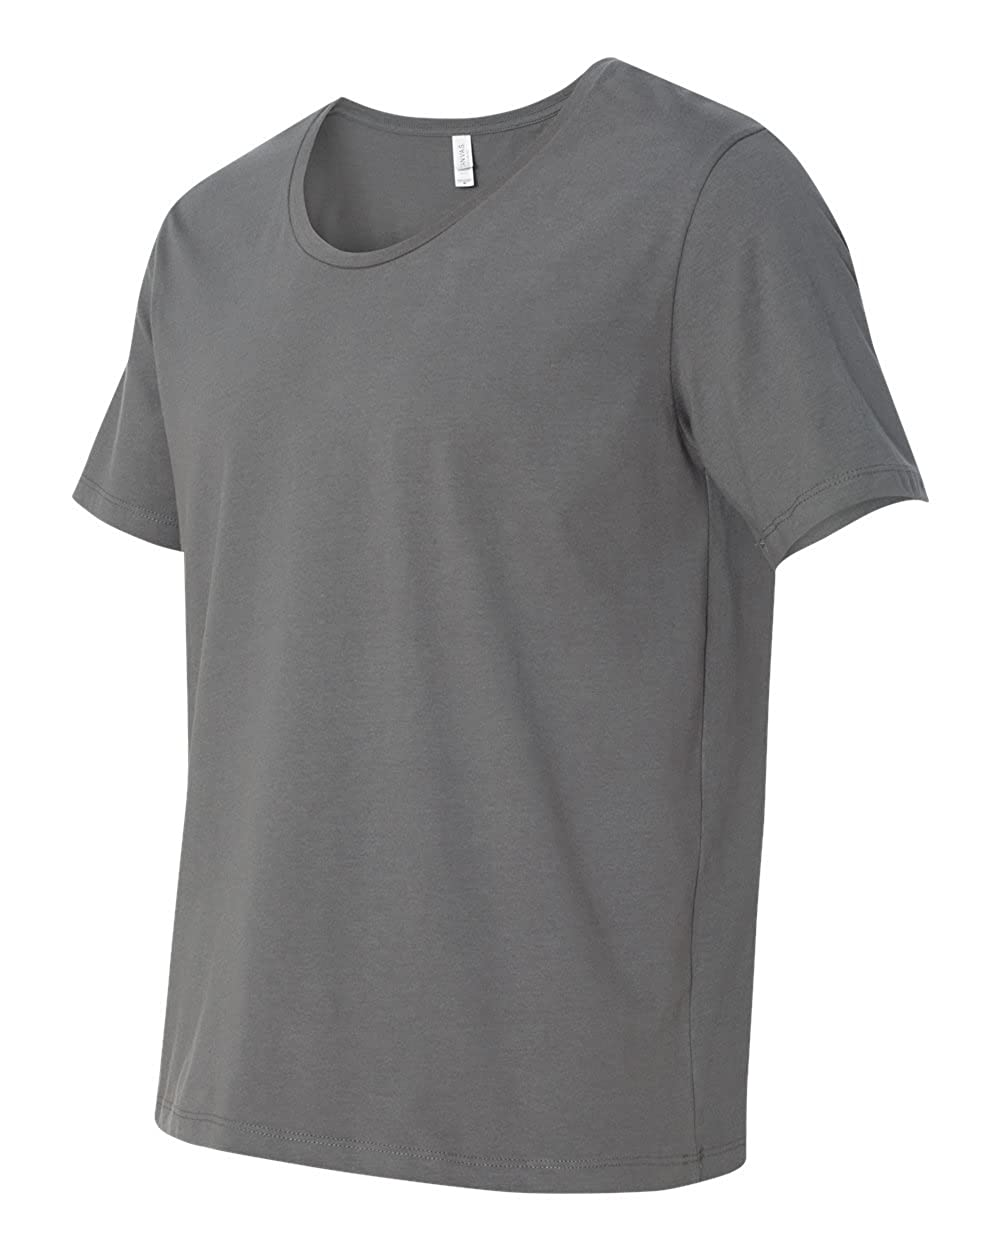 ASPHALT Bella 3406 Canvas Mens Jersey Wide Neck T-Shirt